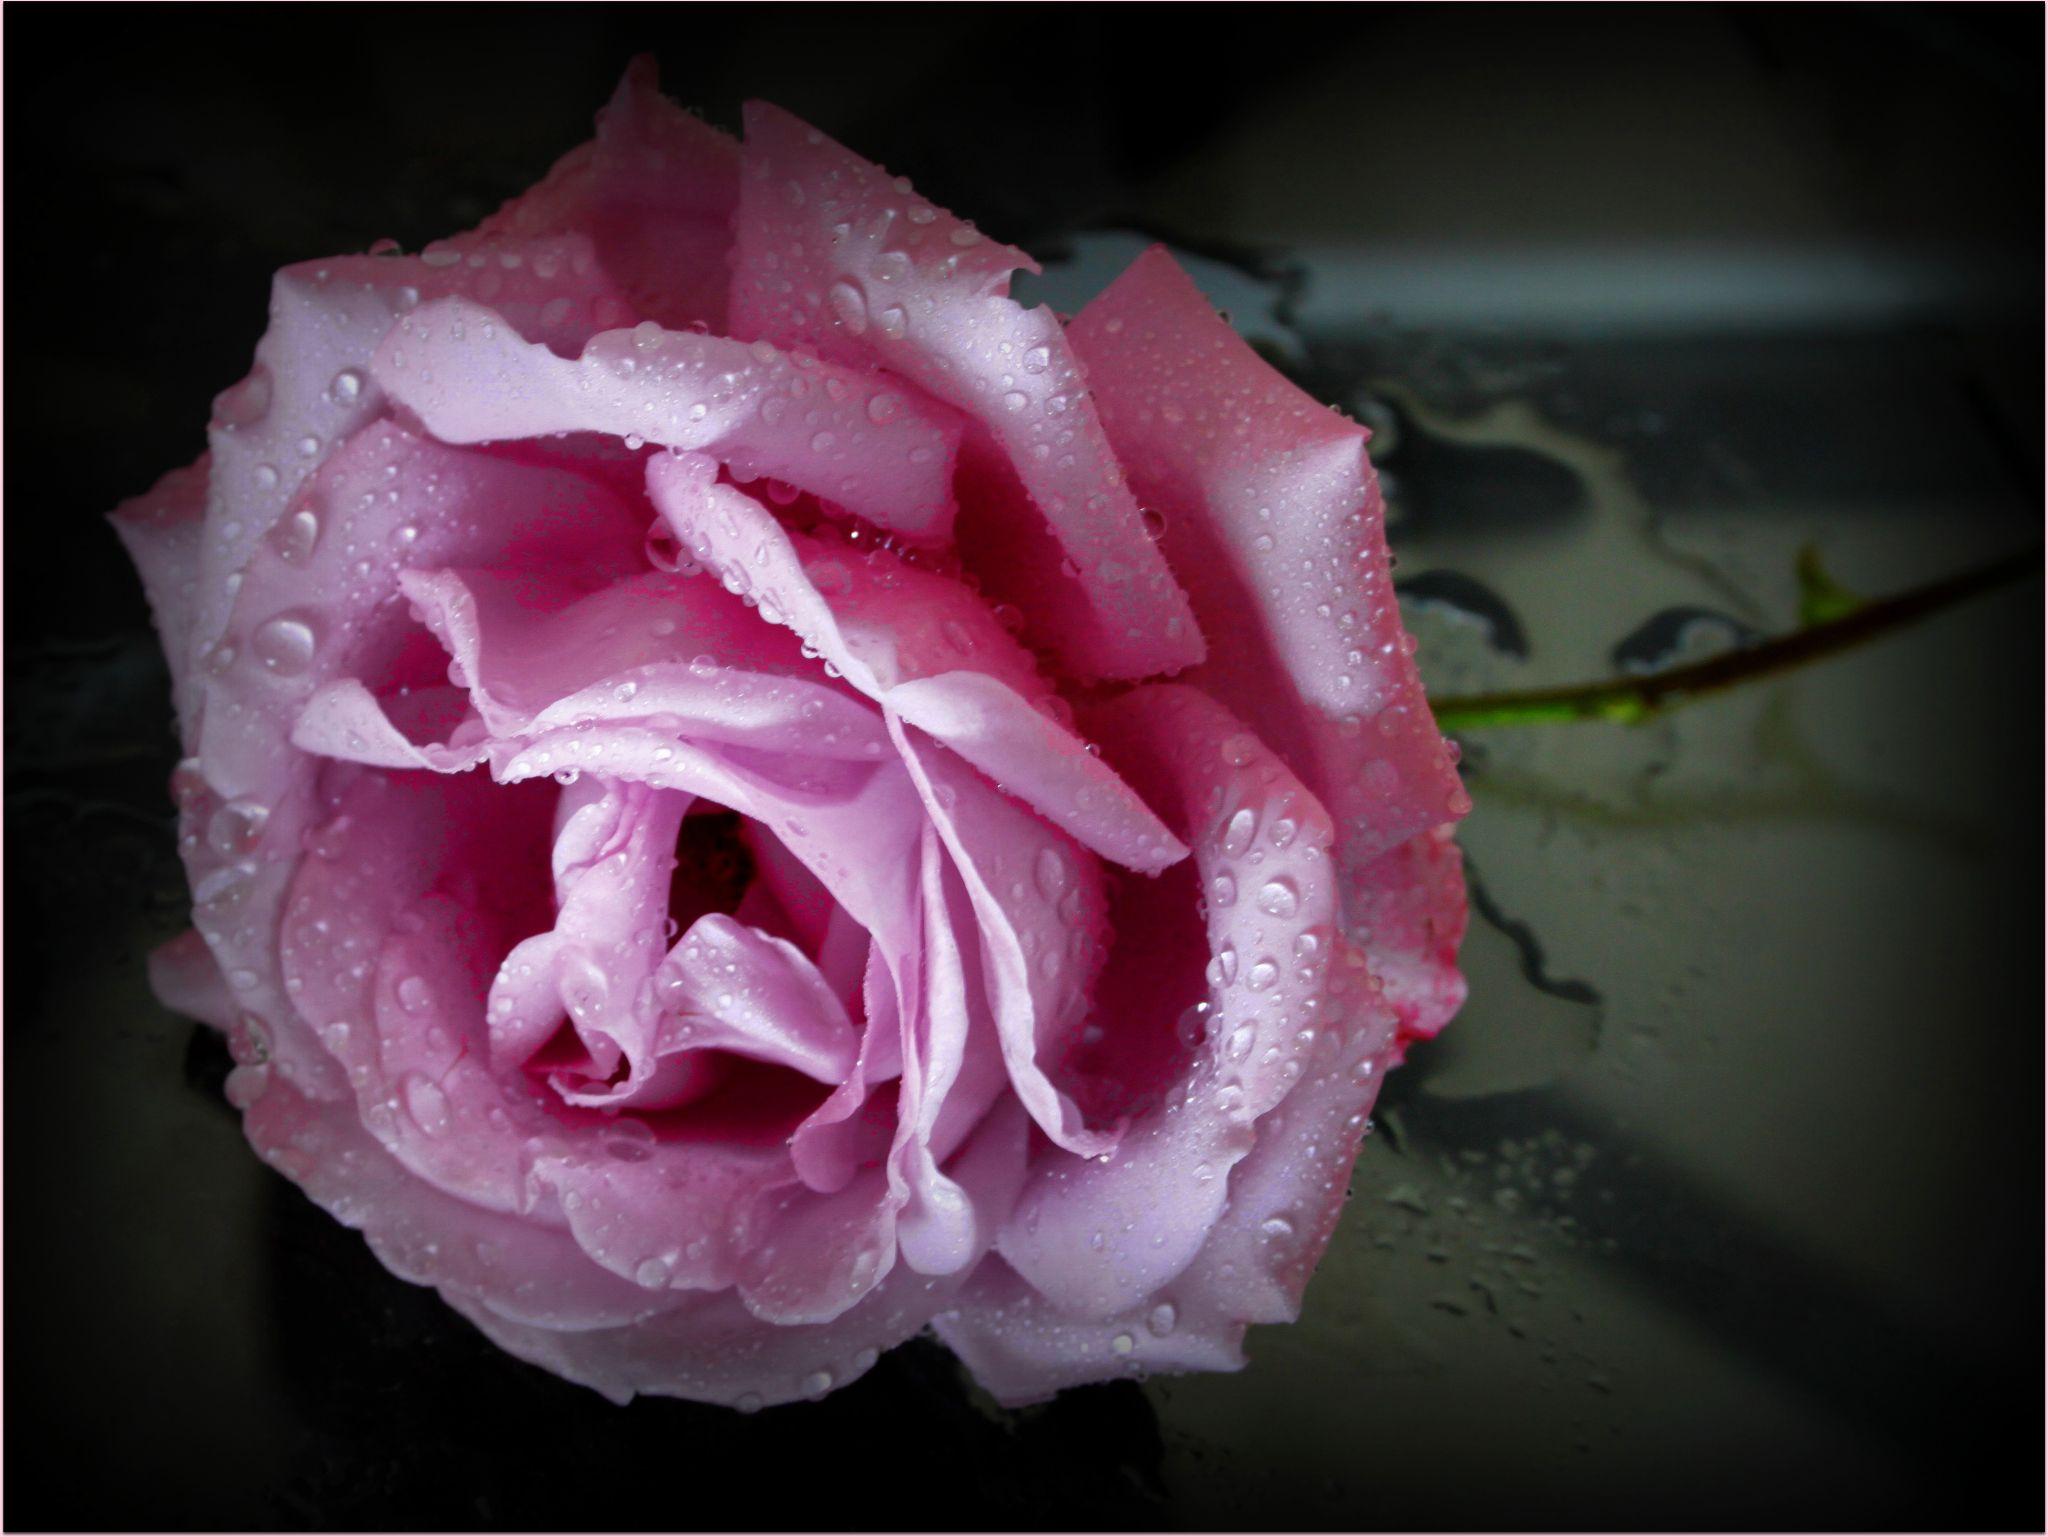 Rosewater by smithandredavid